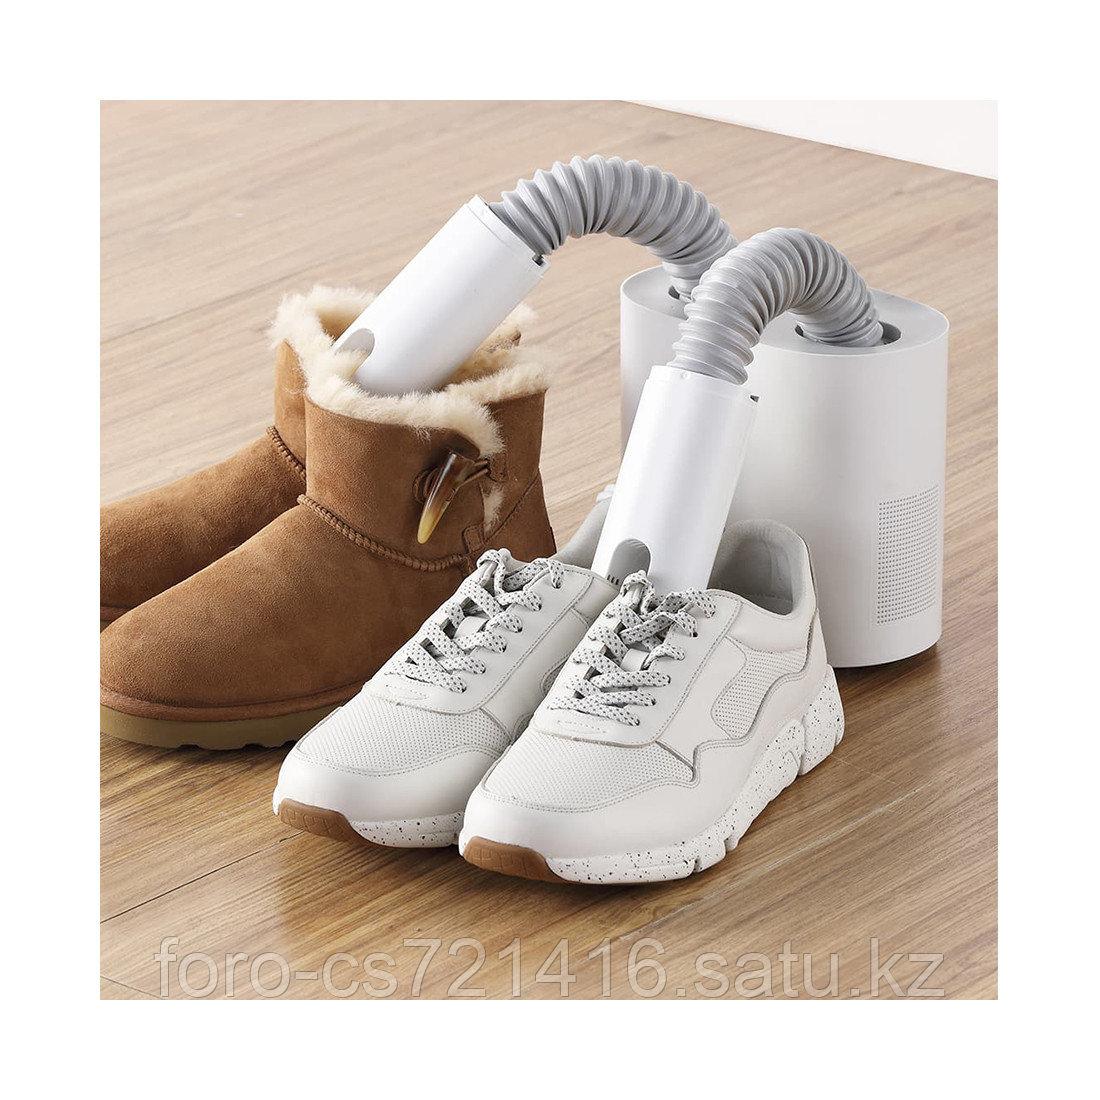 Сушилка для обуви Deerma HX10 Shoe dryer - фото 3